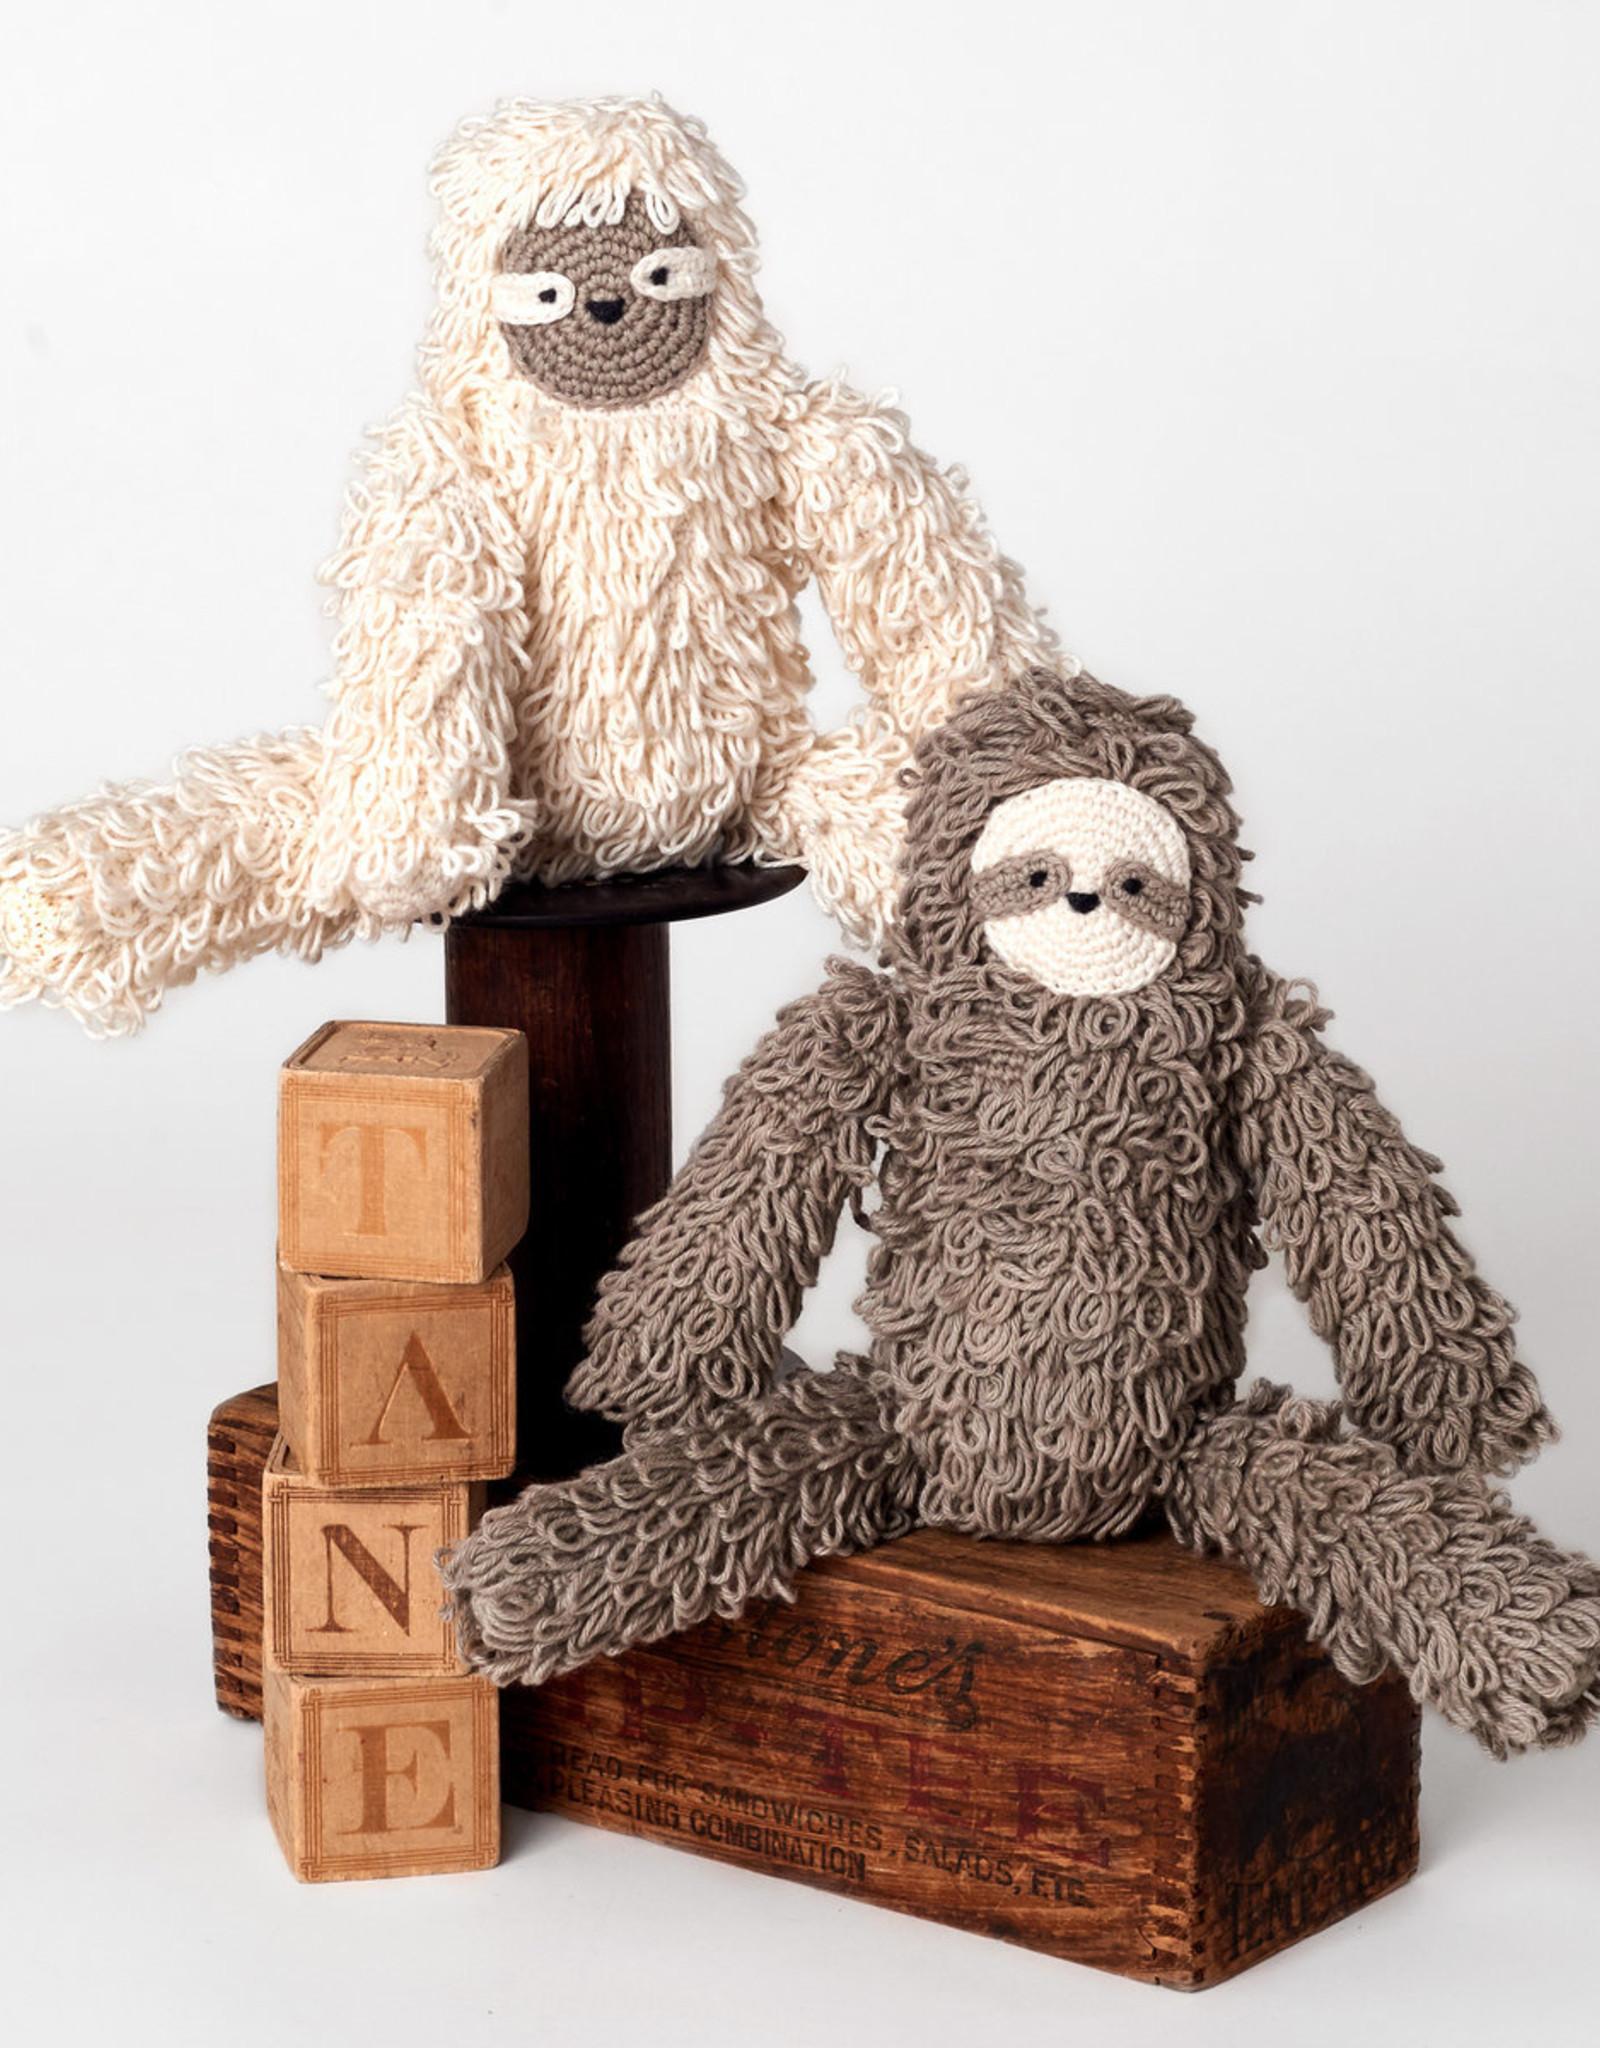 Tane Organics Mando, the sloth